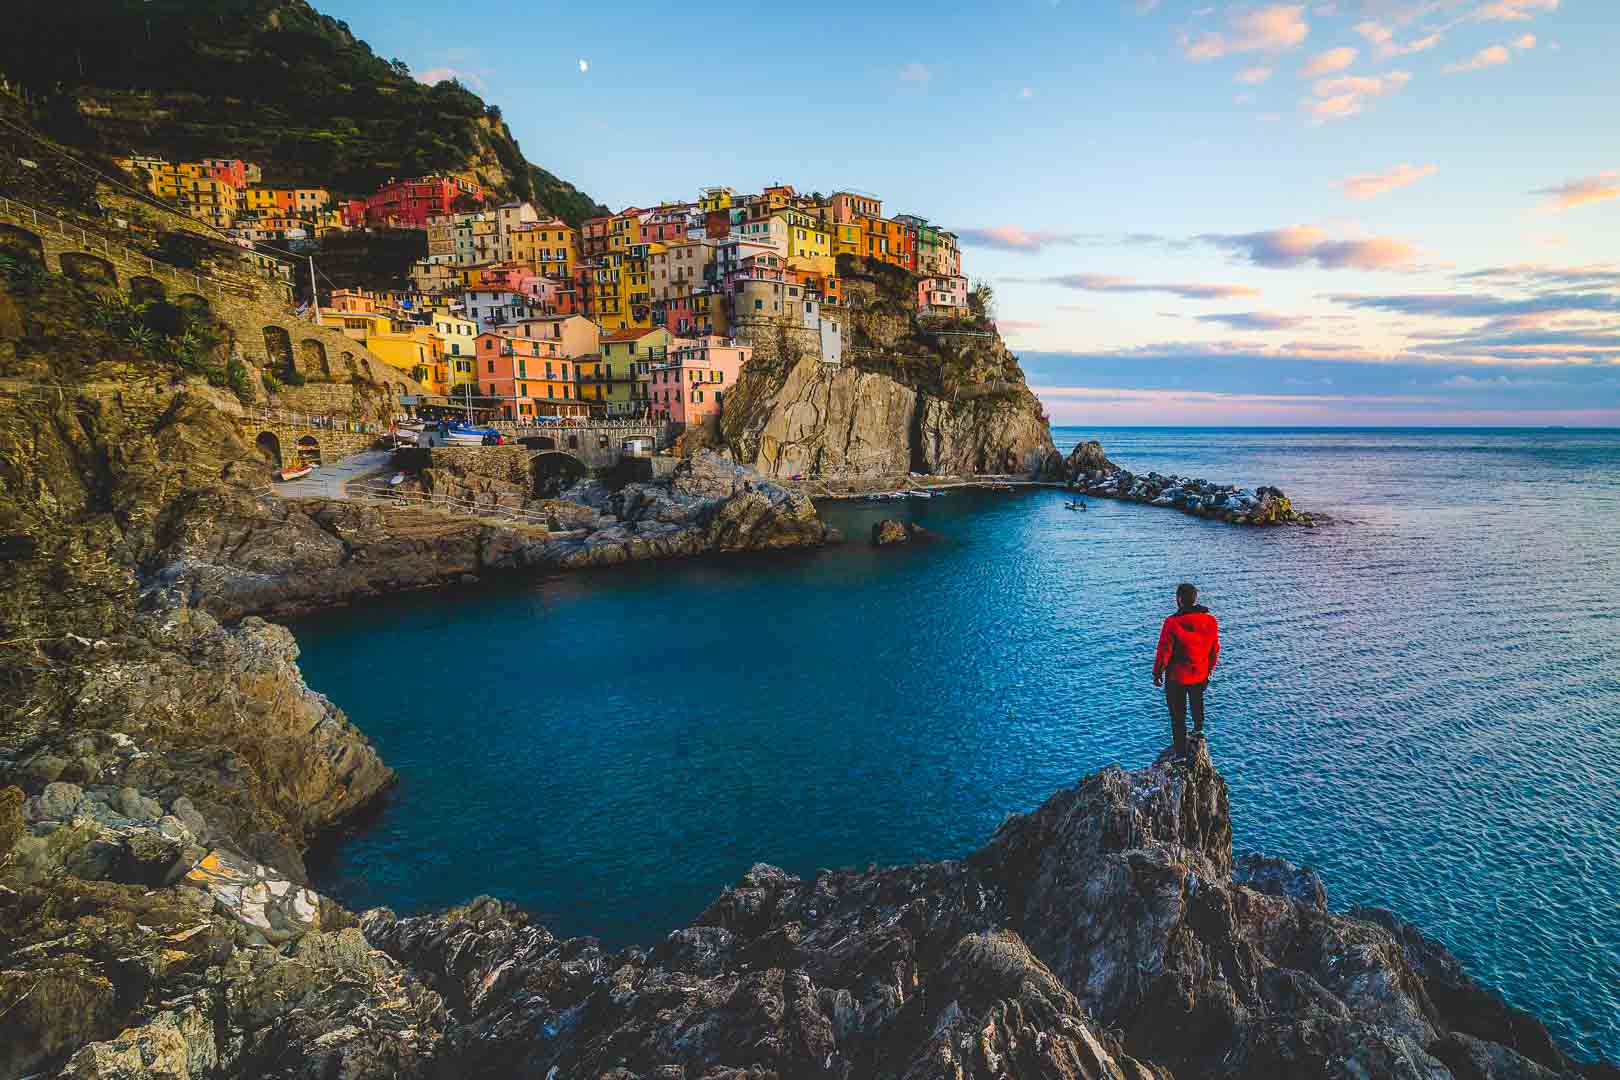 The Heart Of Cinque Terre manarola, cinque terre - visit the oldest village of the